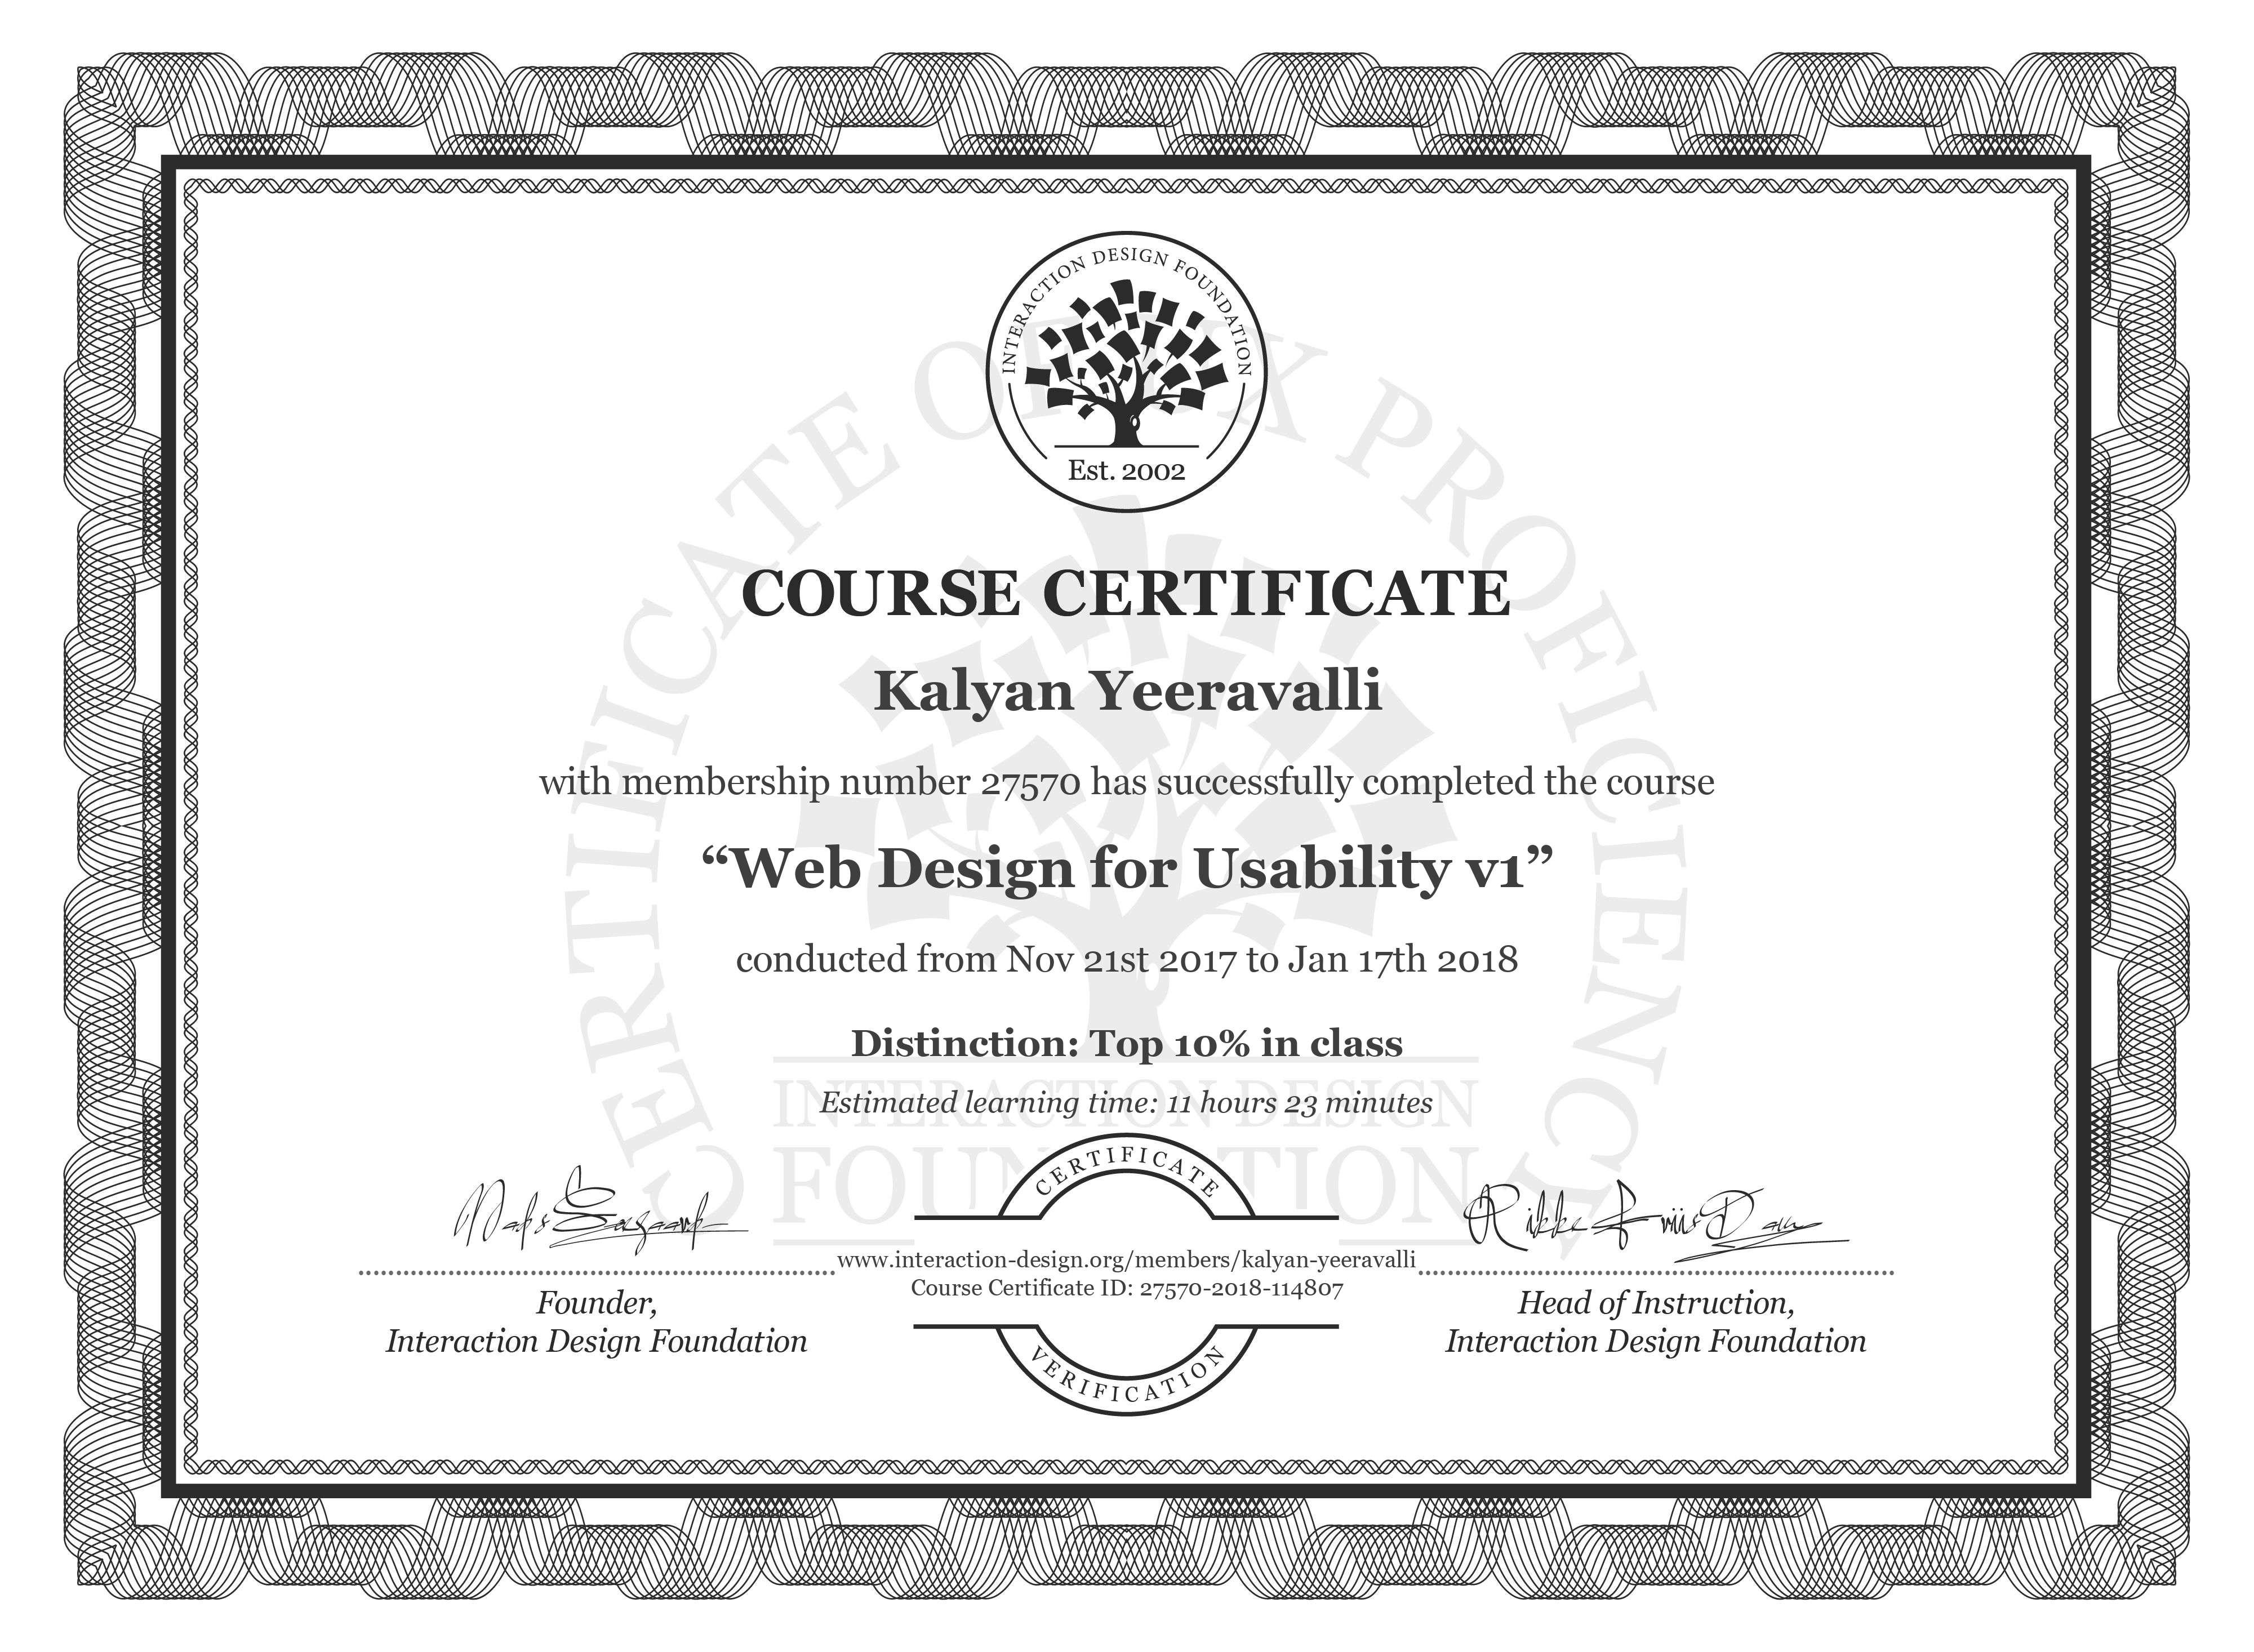 Kalyan Yeeravalli: Course Certificate - Web Design for Usability